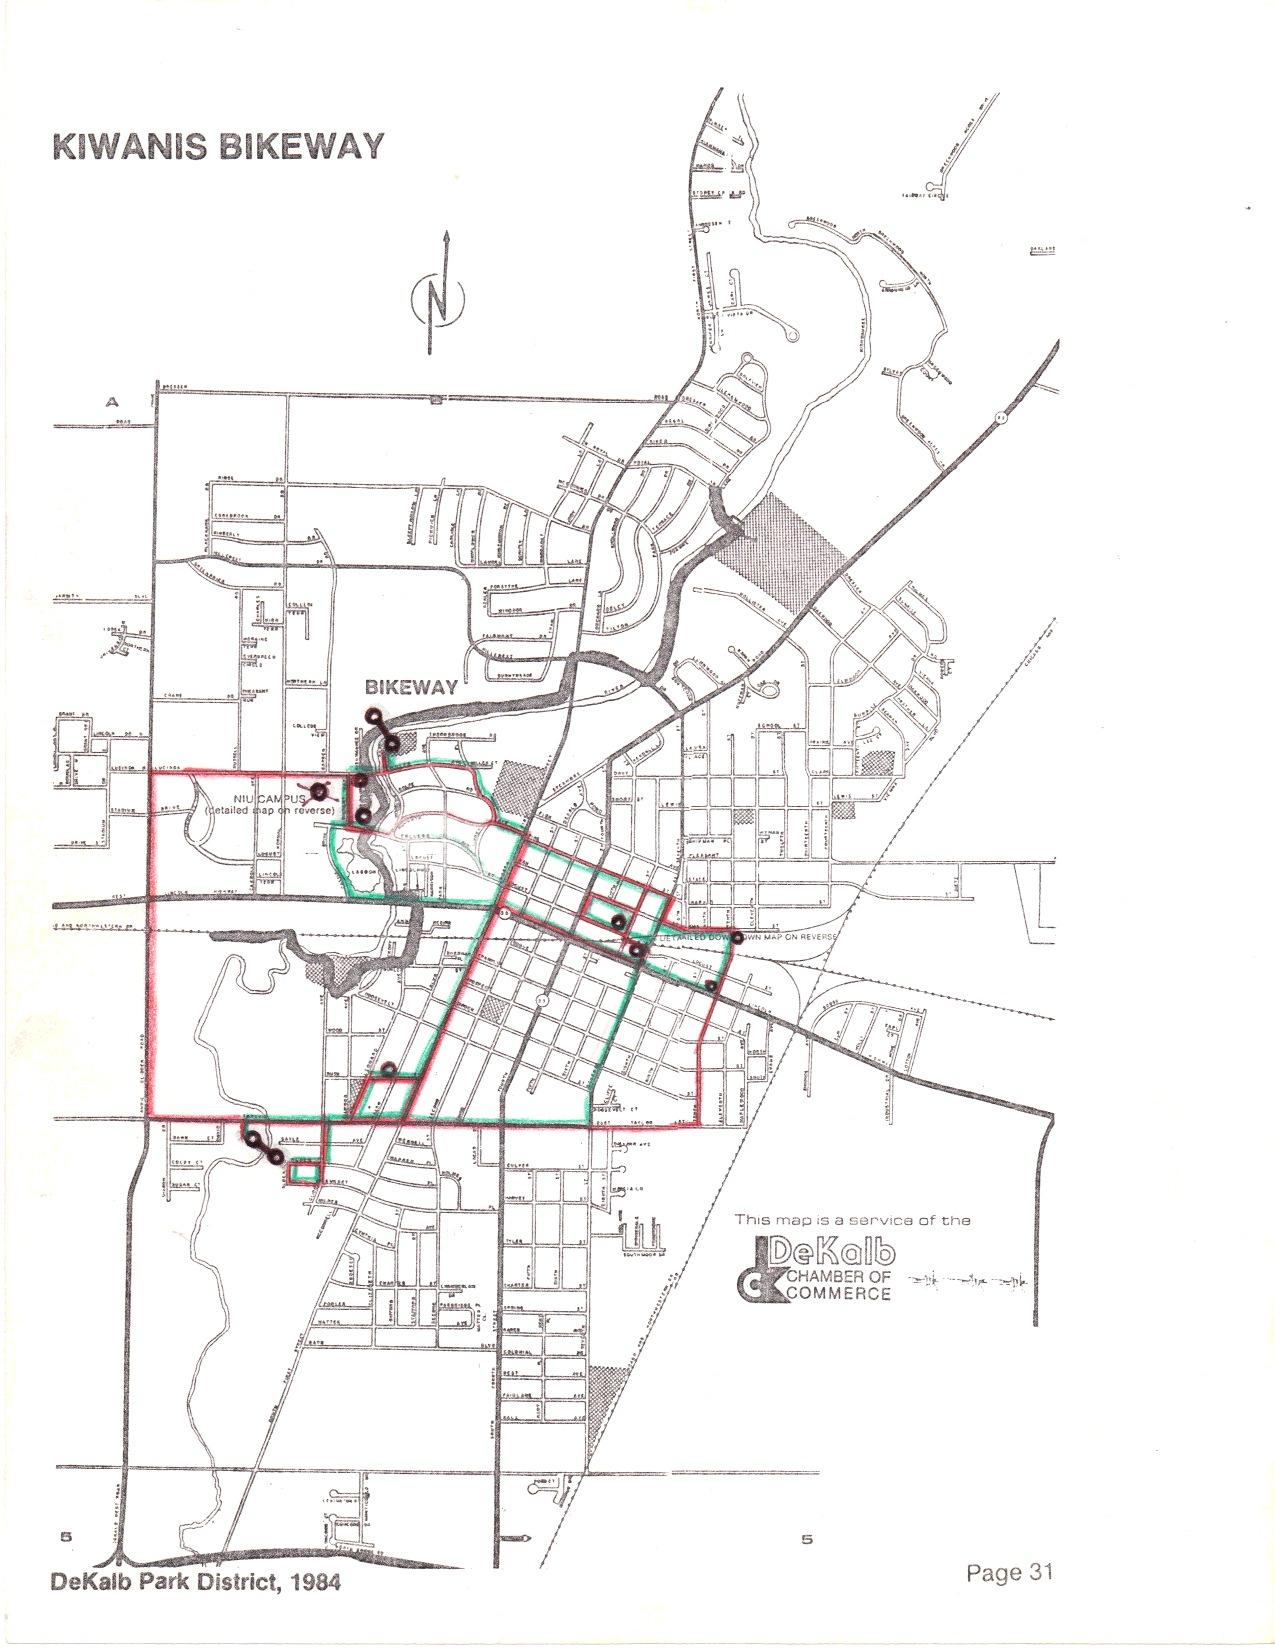 ArtBus route plan, 1985